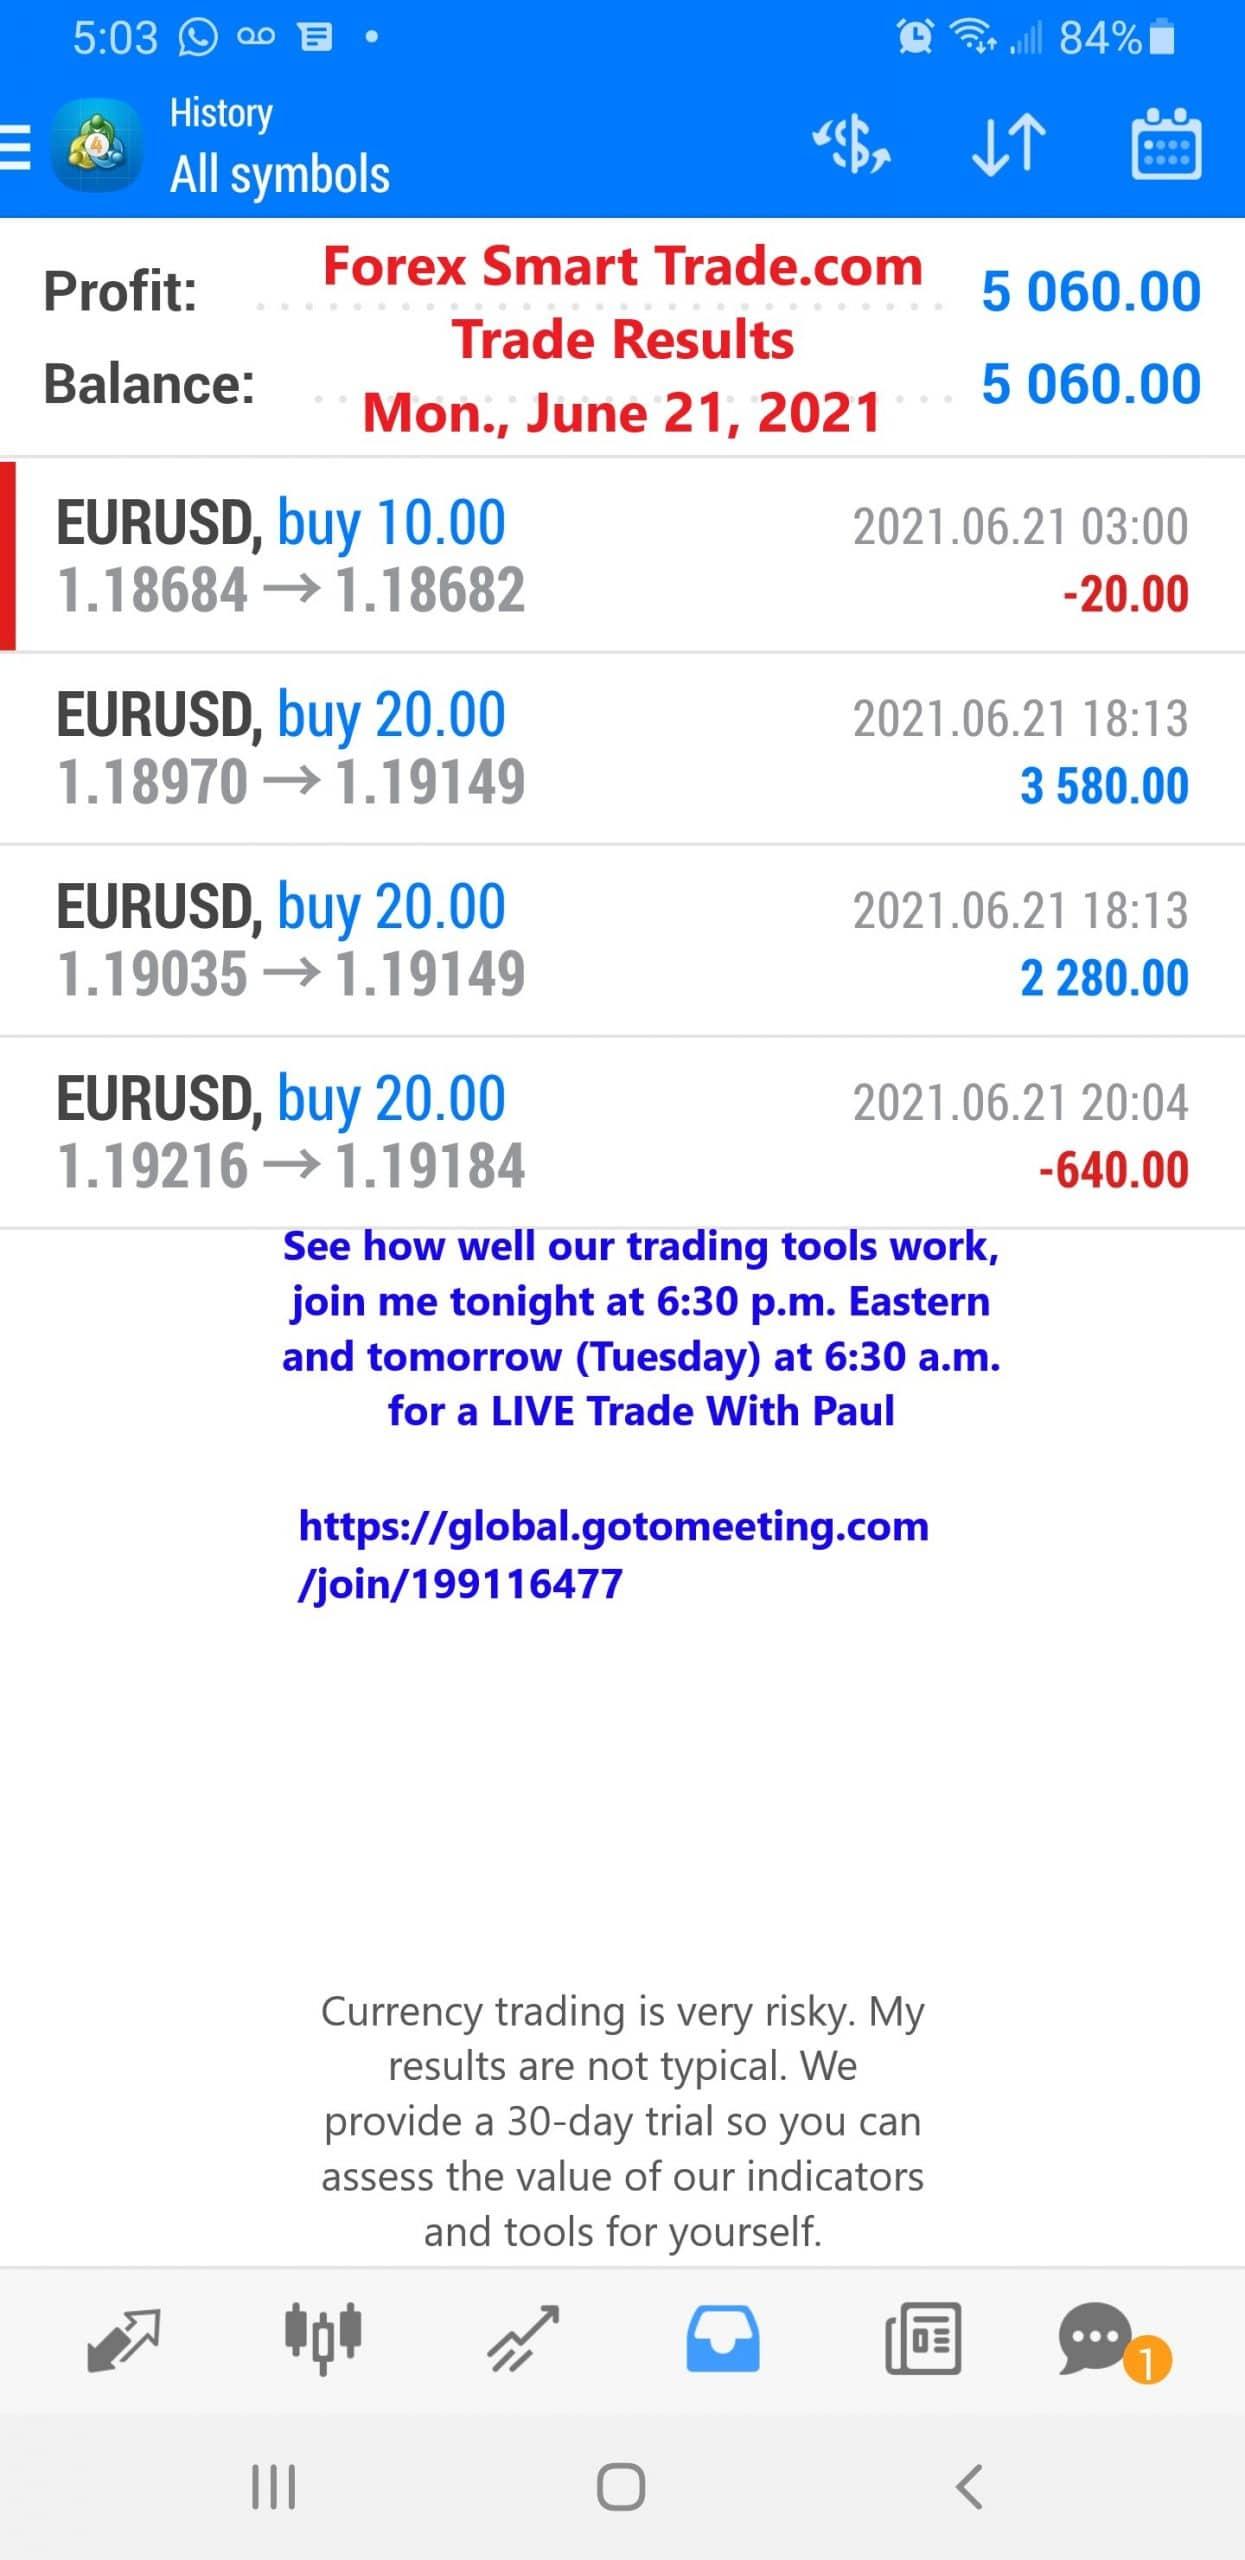 Trade Results June 10, 2021 - Forex Smart Trade